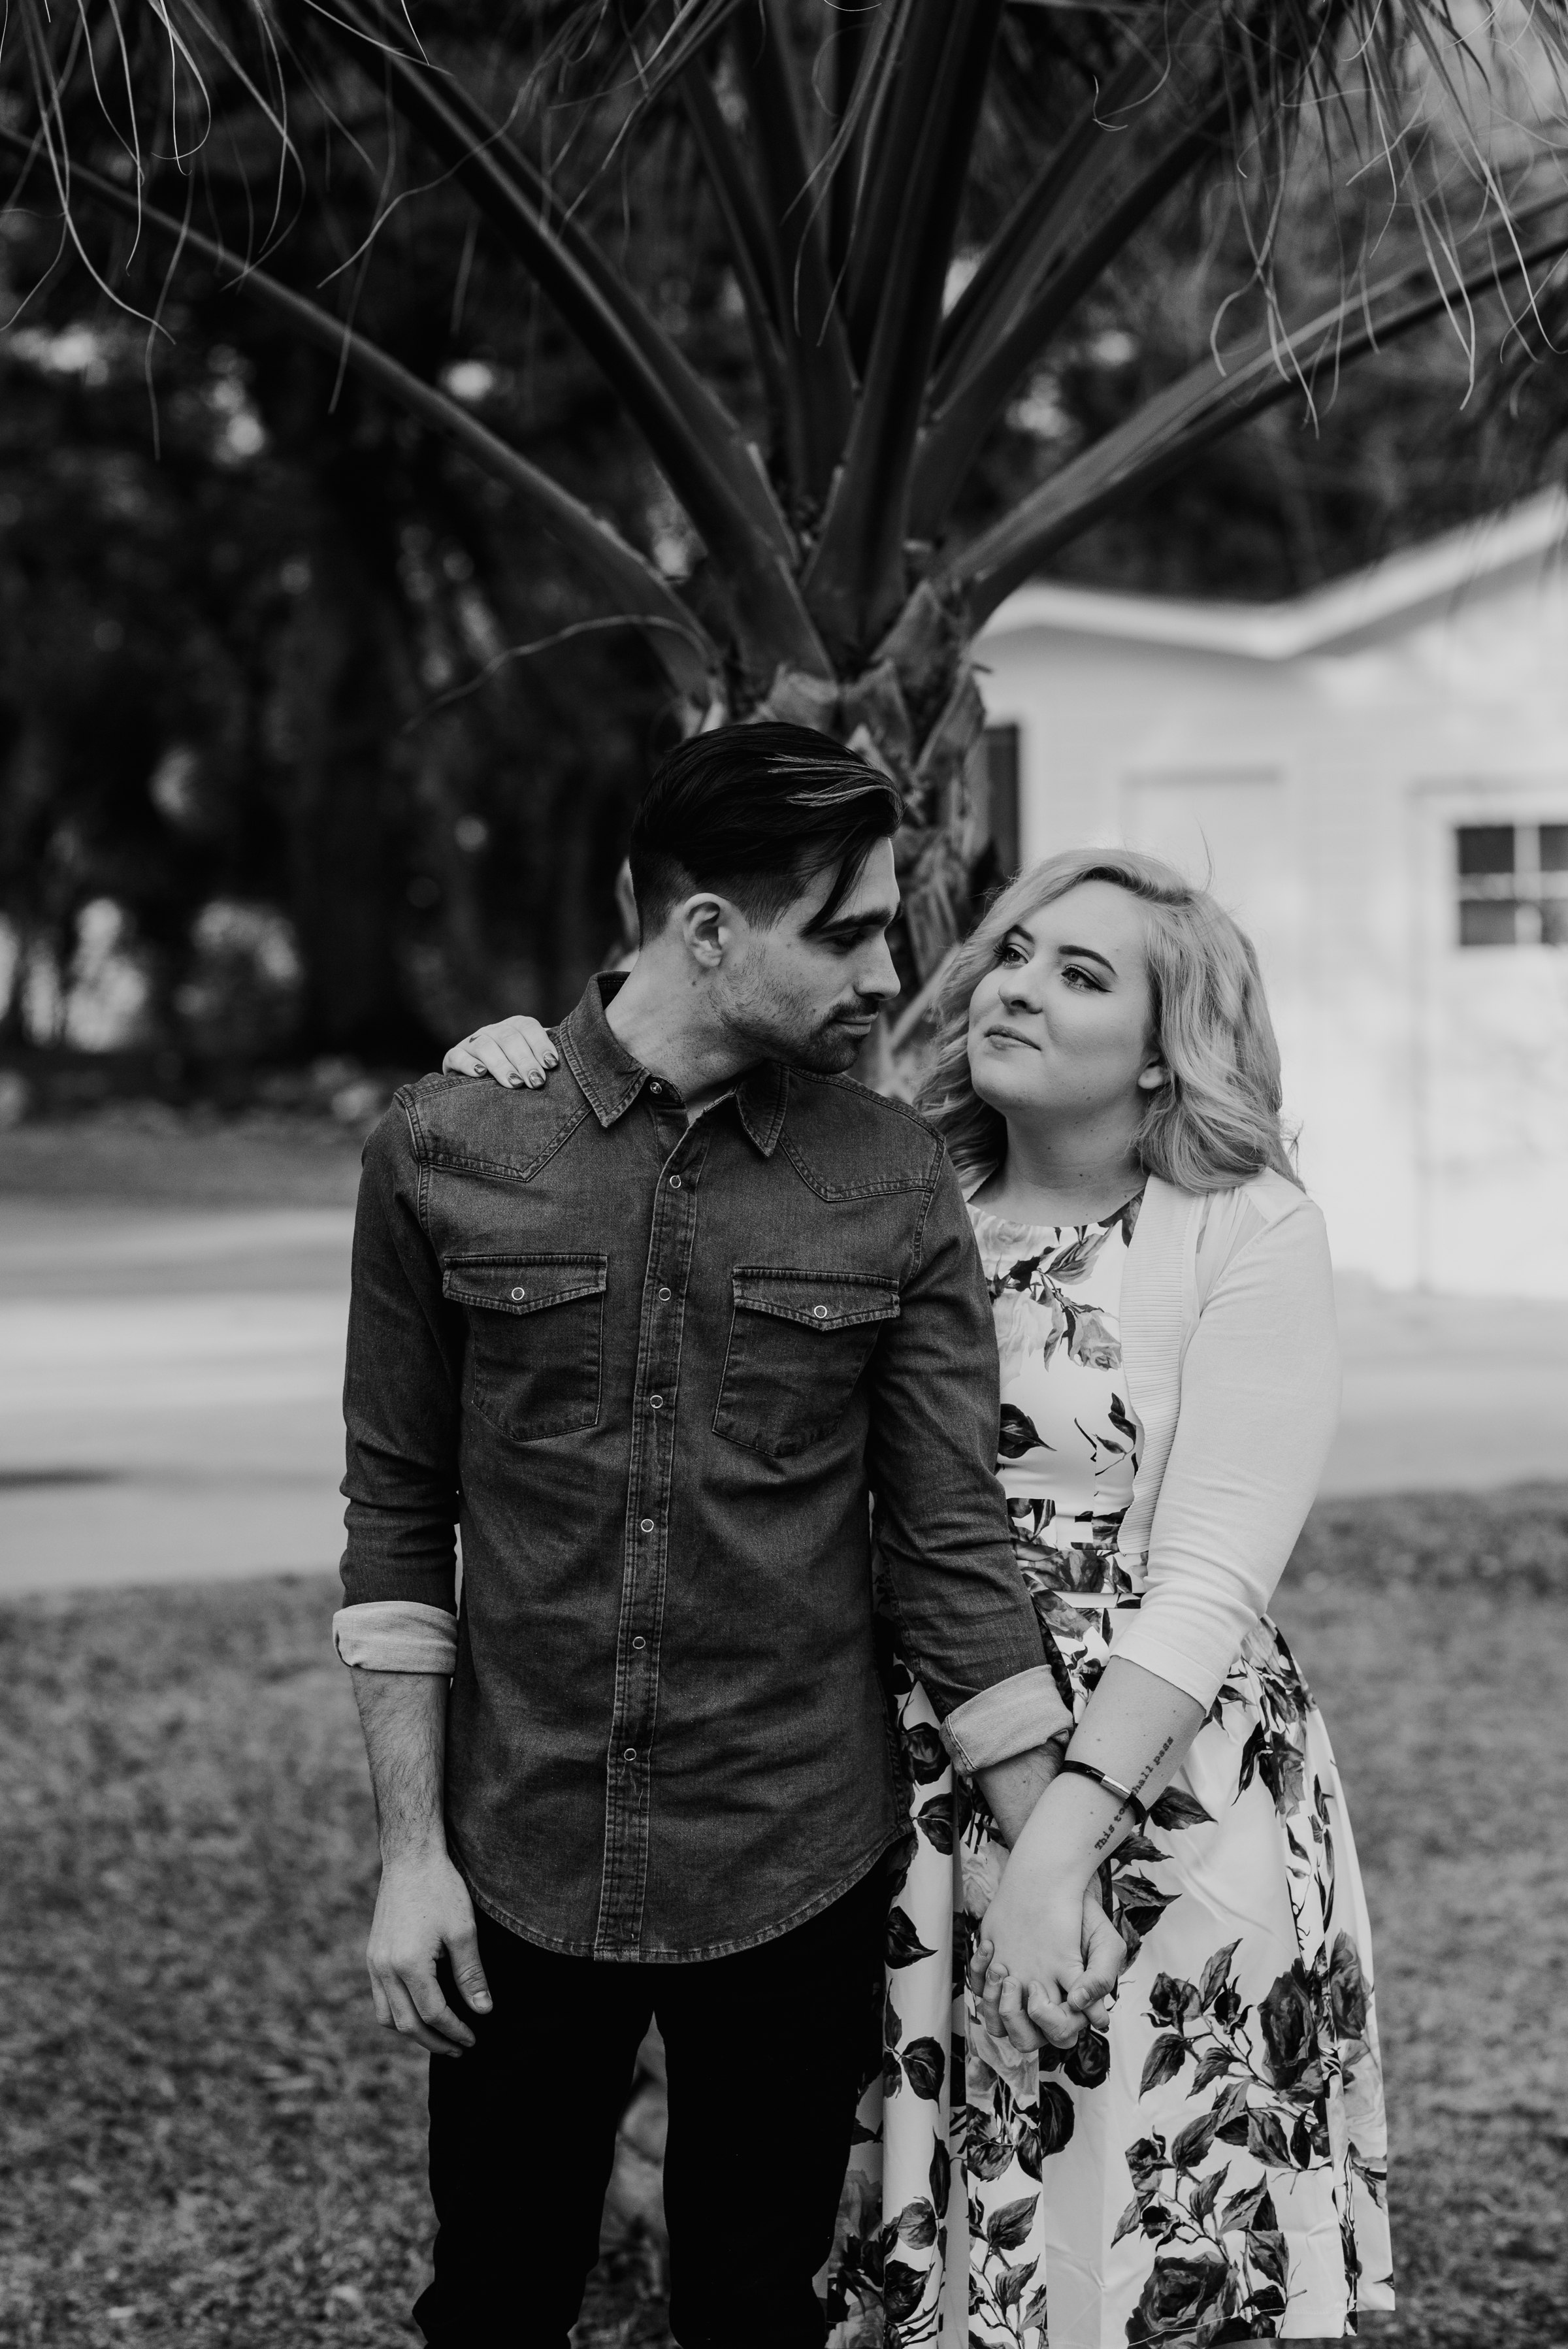 drew-andrew-texas-austin-minnesota-minneapolis-wedding-photographer-destination-elopement-intimate-adventurous_0073.jpg